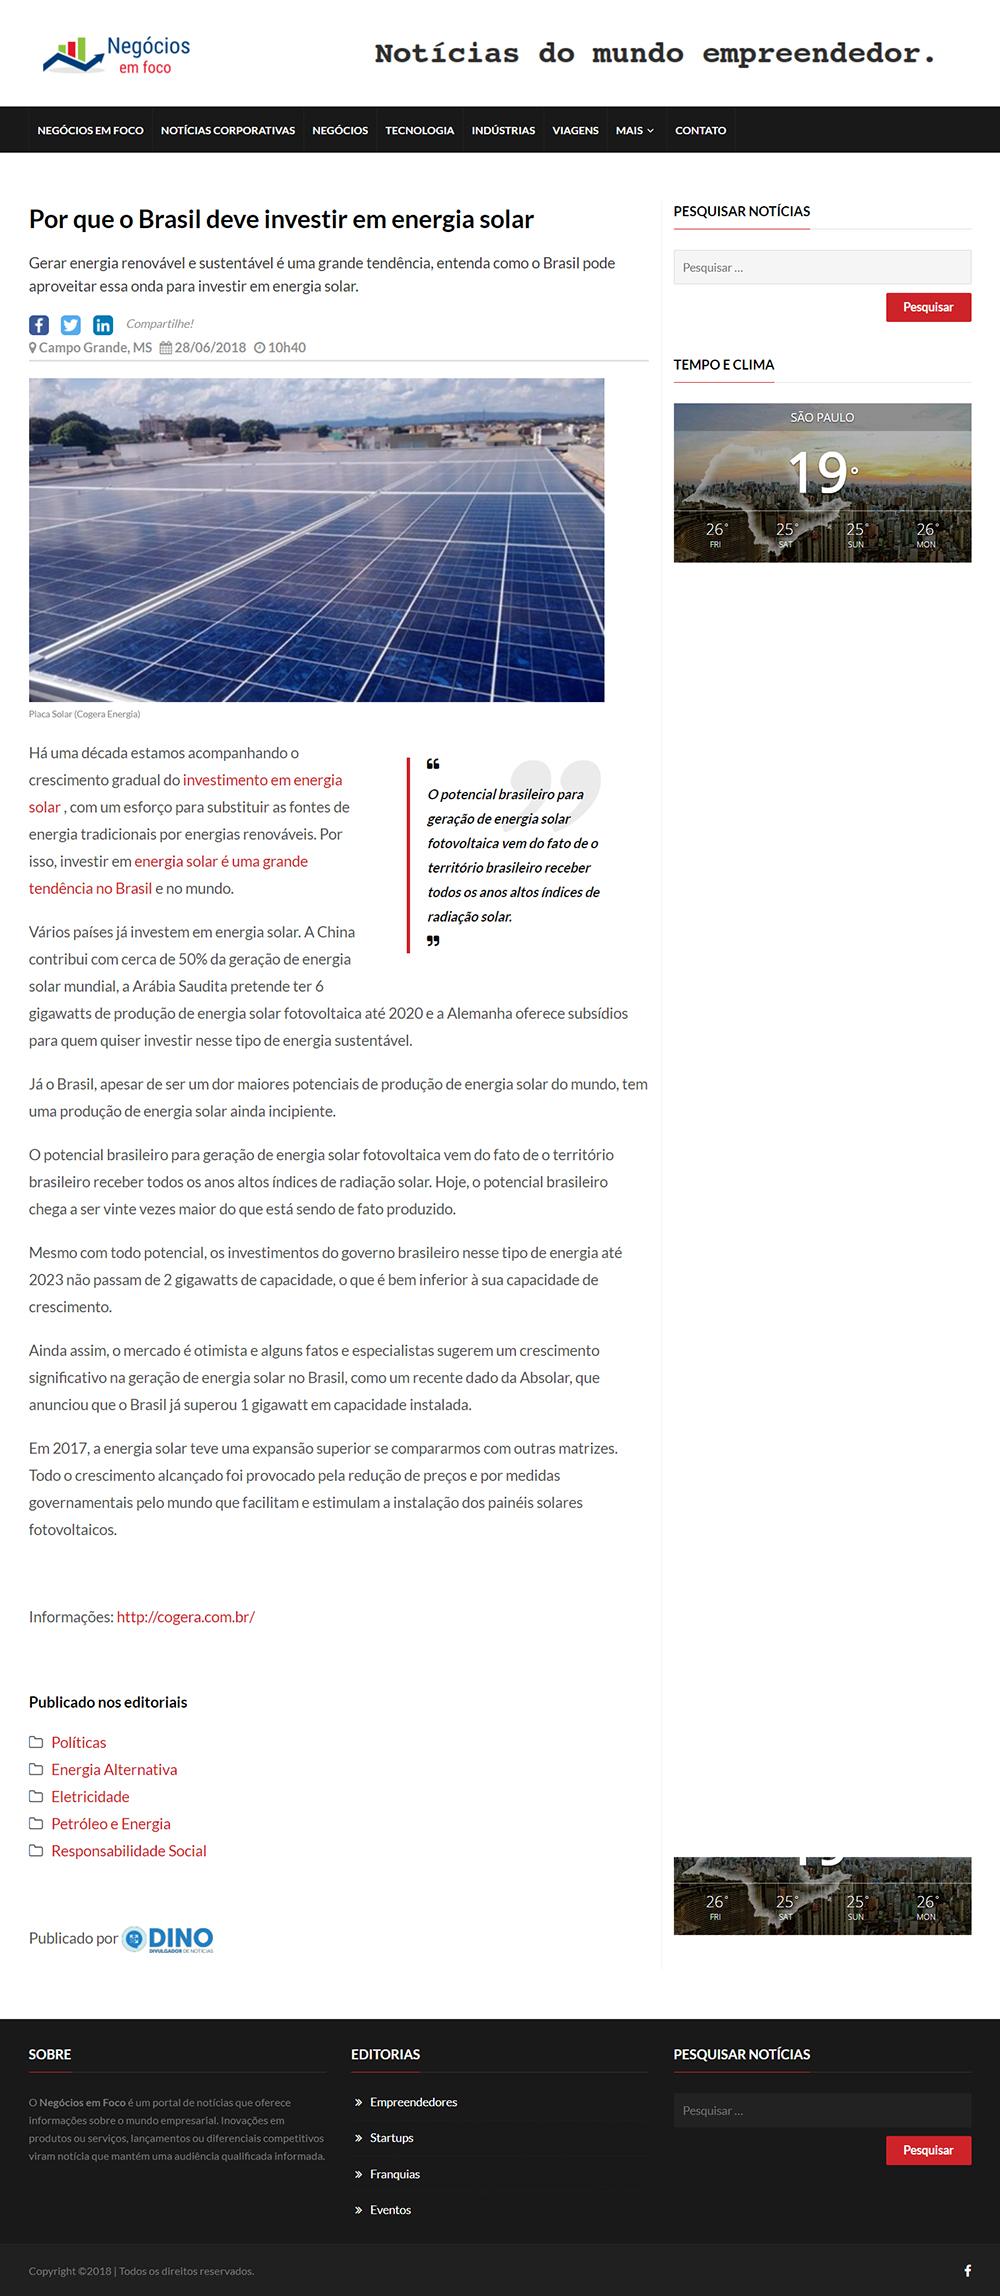 O Brasil deve investir em energia solar